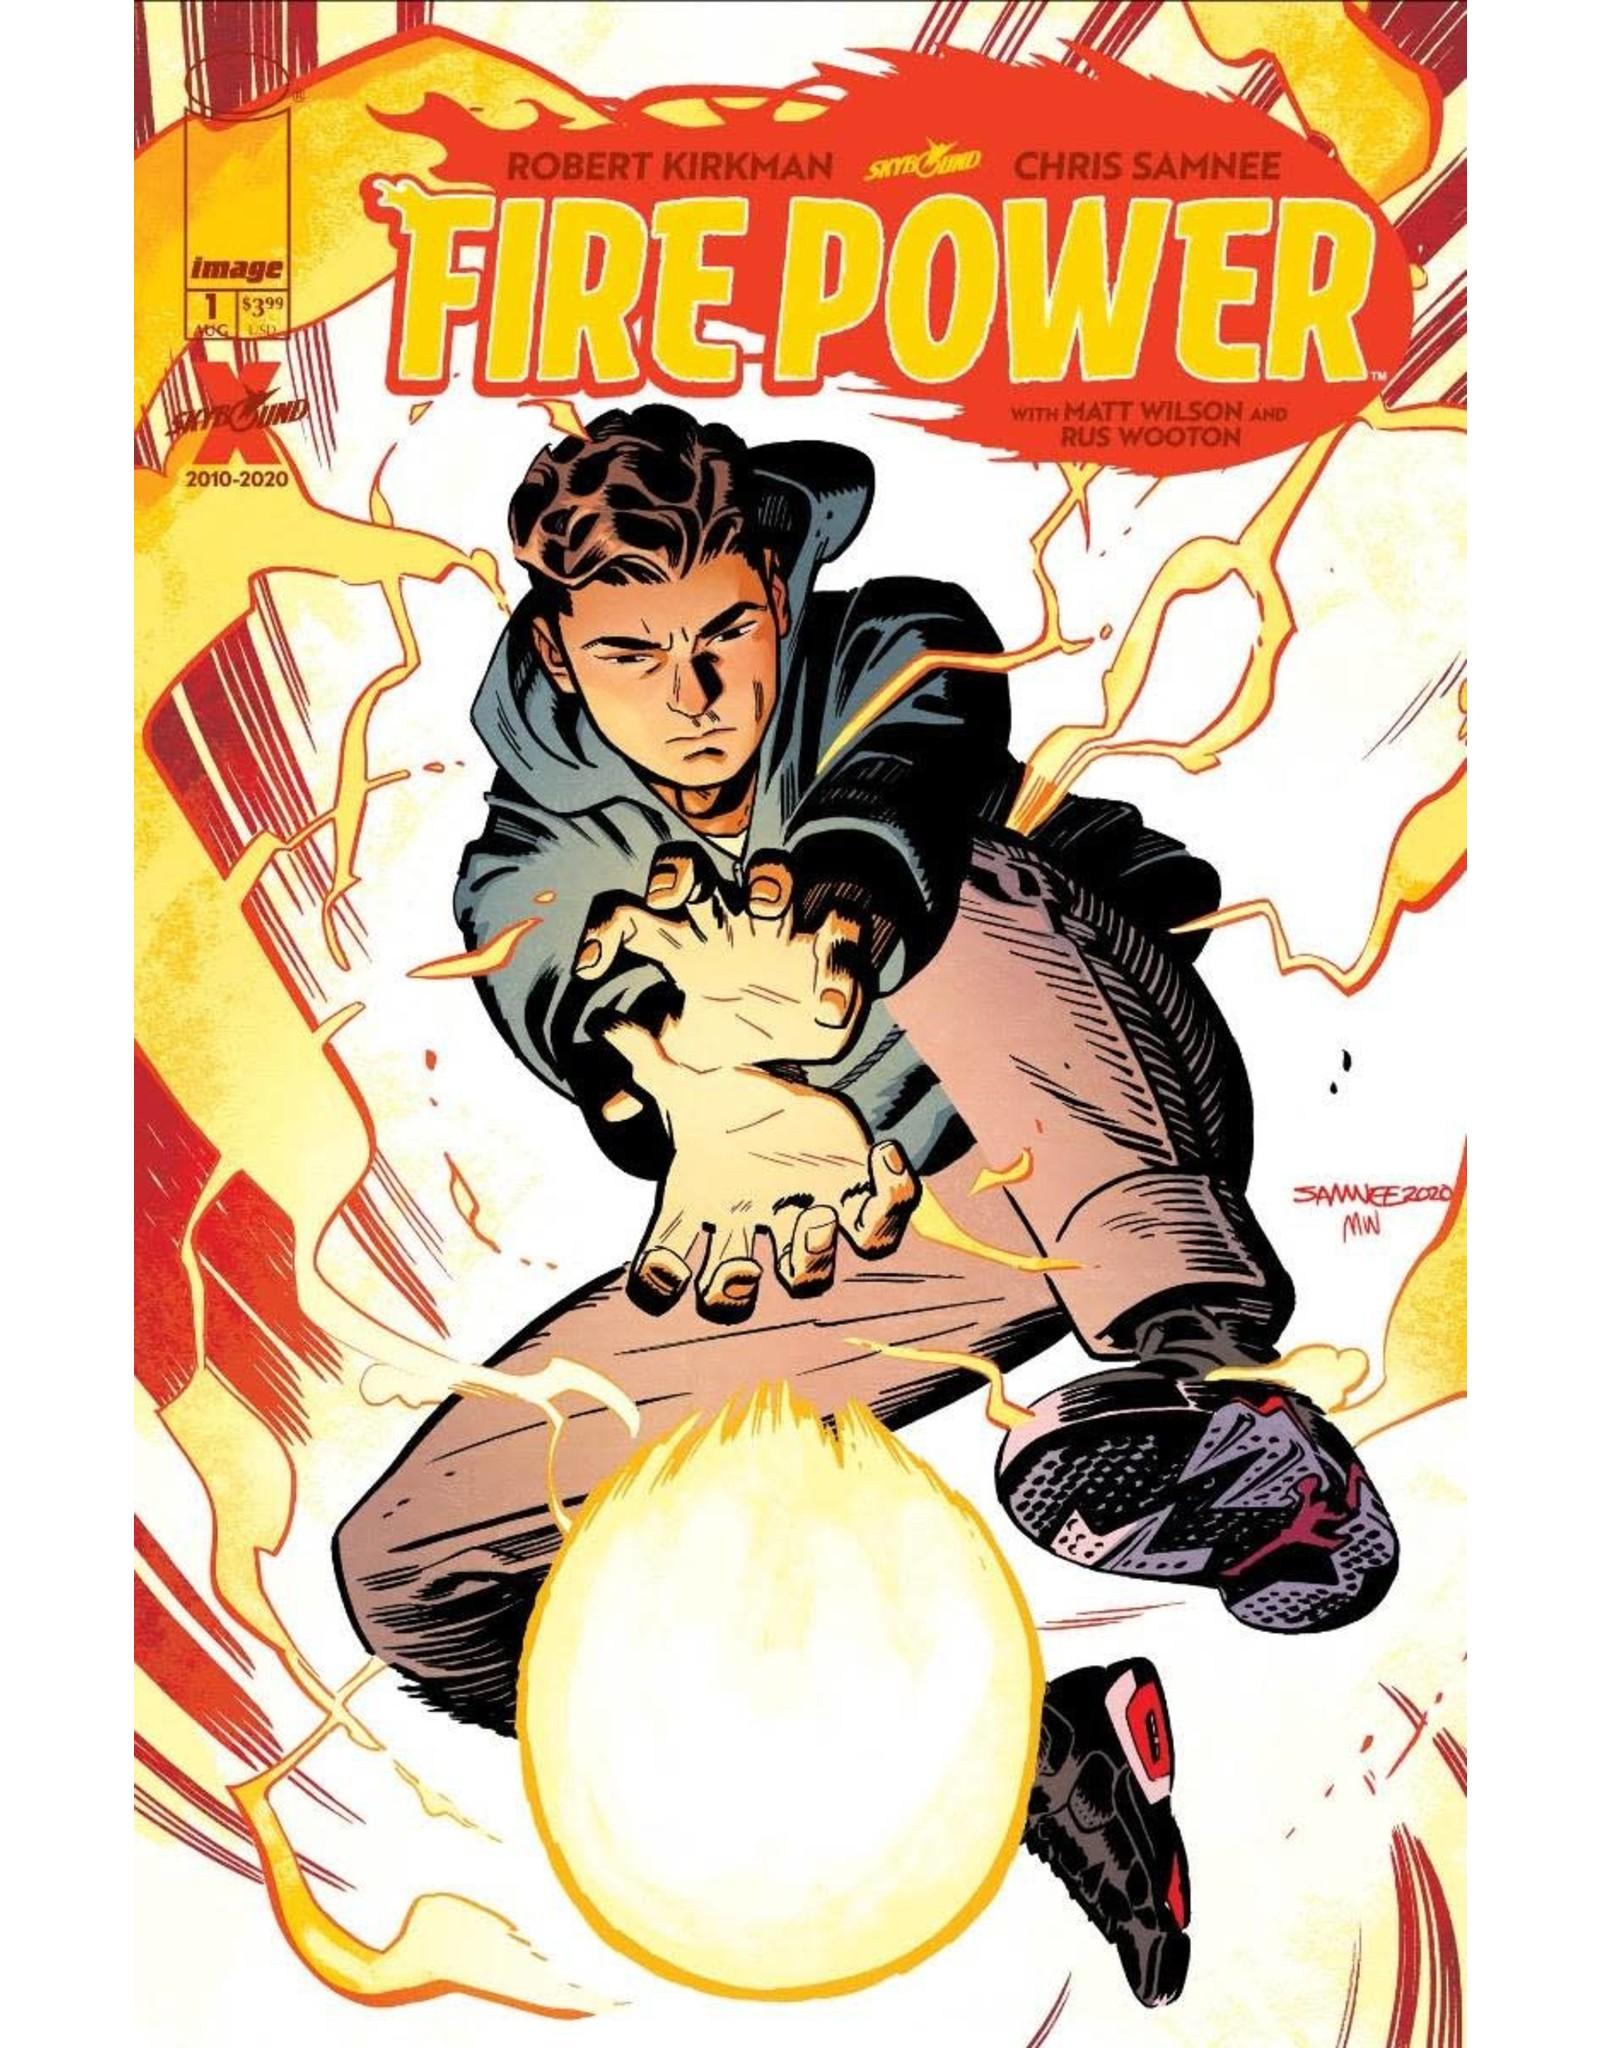 IMAGE COMICS FIRE POWER BY KIRKMAN & SAMNEE #1